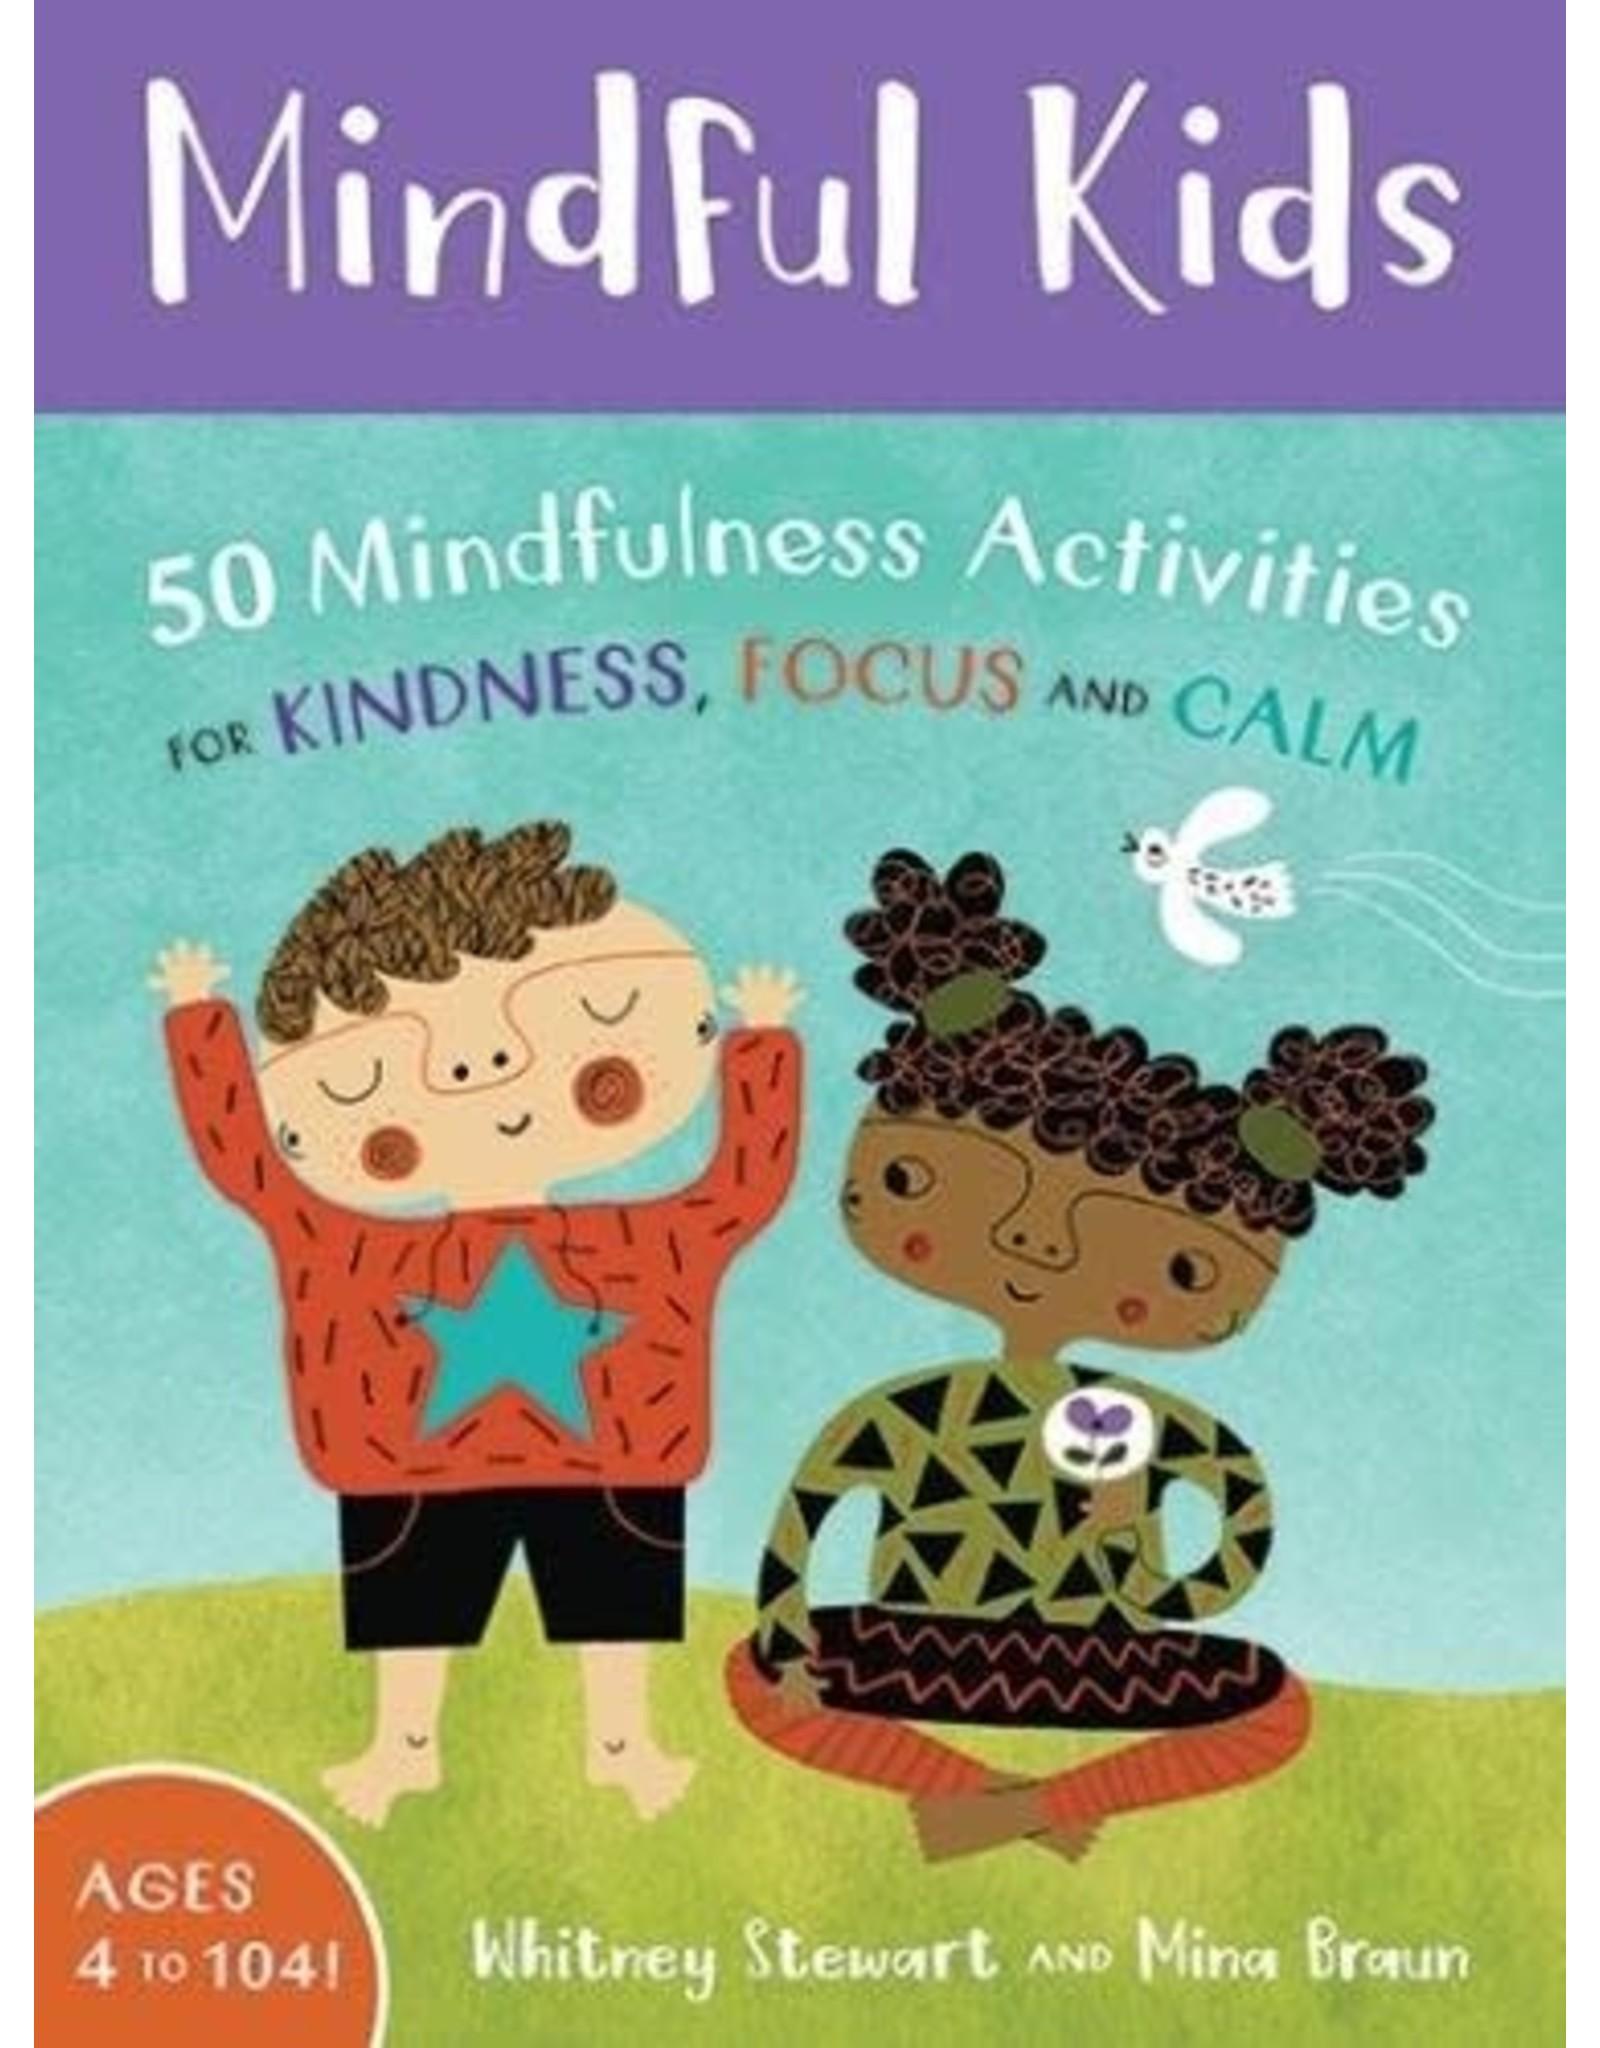 Mindful Kids Cards